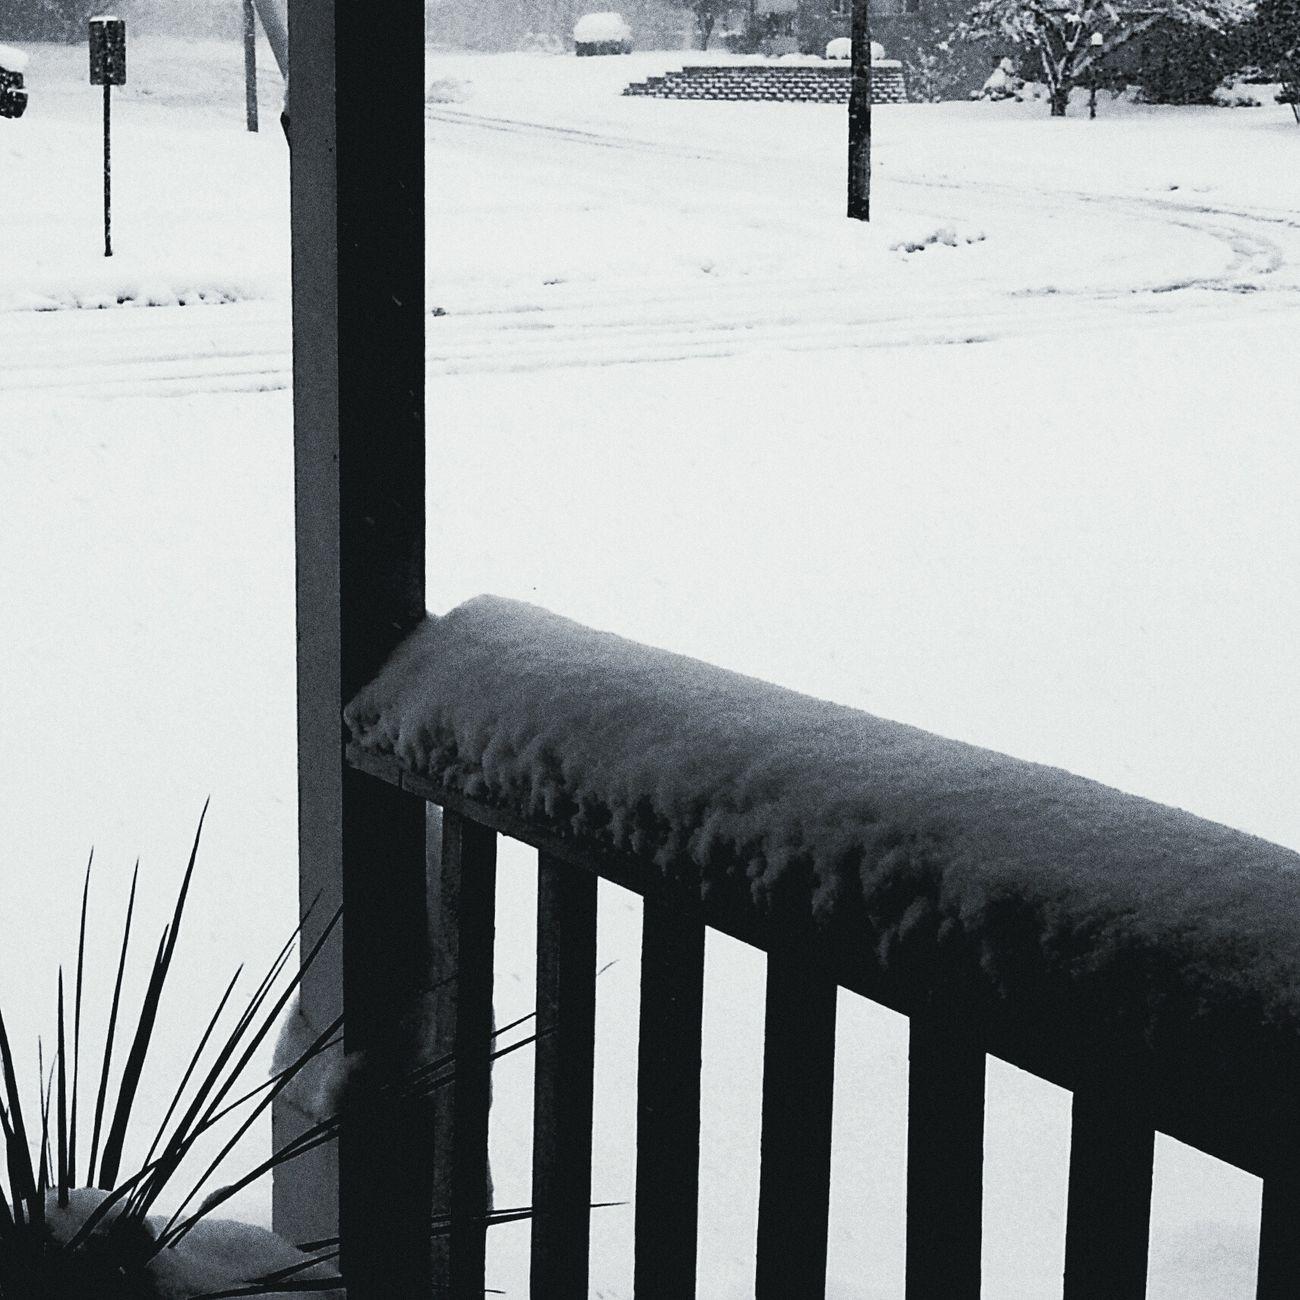 How Do You See Climate Change? Eyeem More Snow Than Ever EyeemJuliasGallery Eyeem Cold Deep Depressing Winters